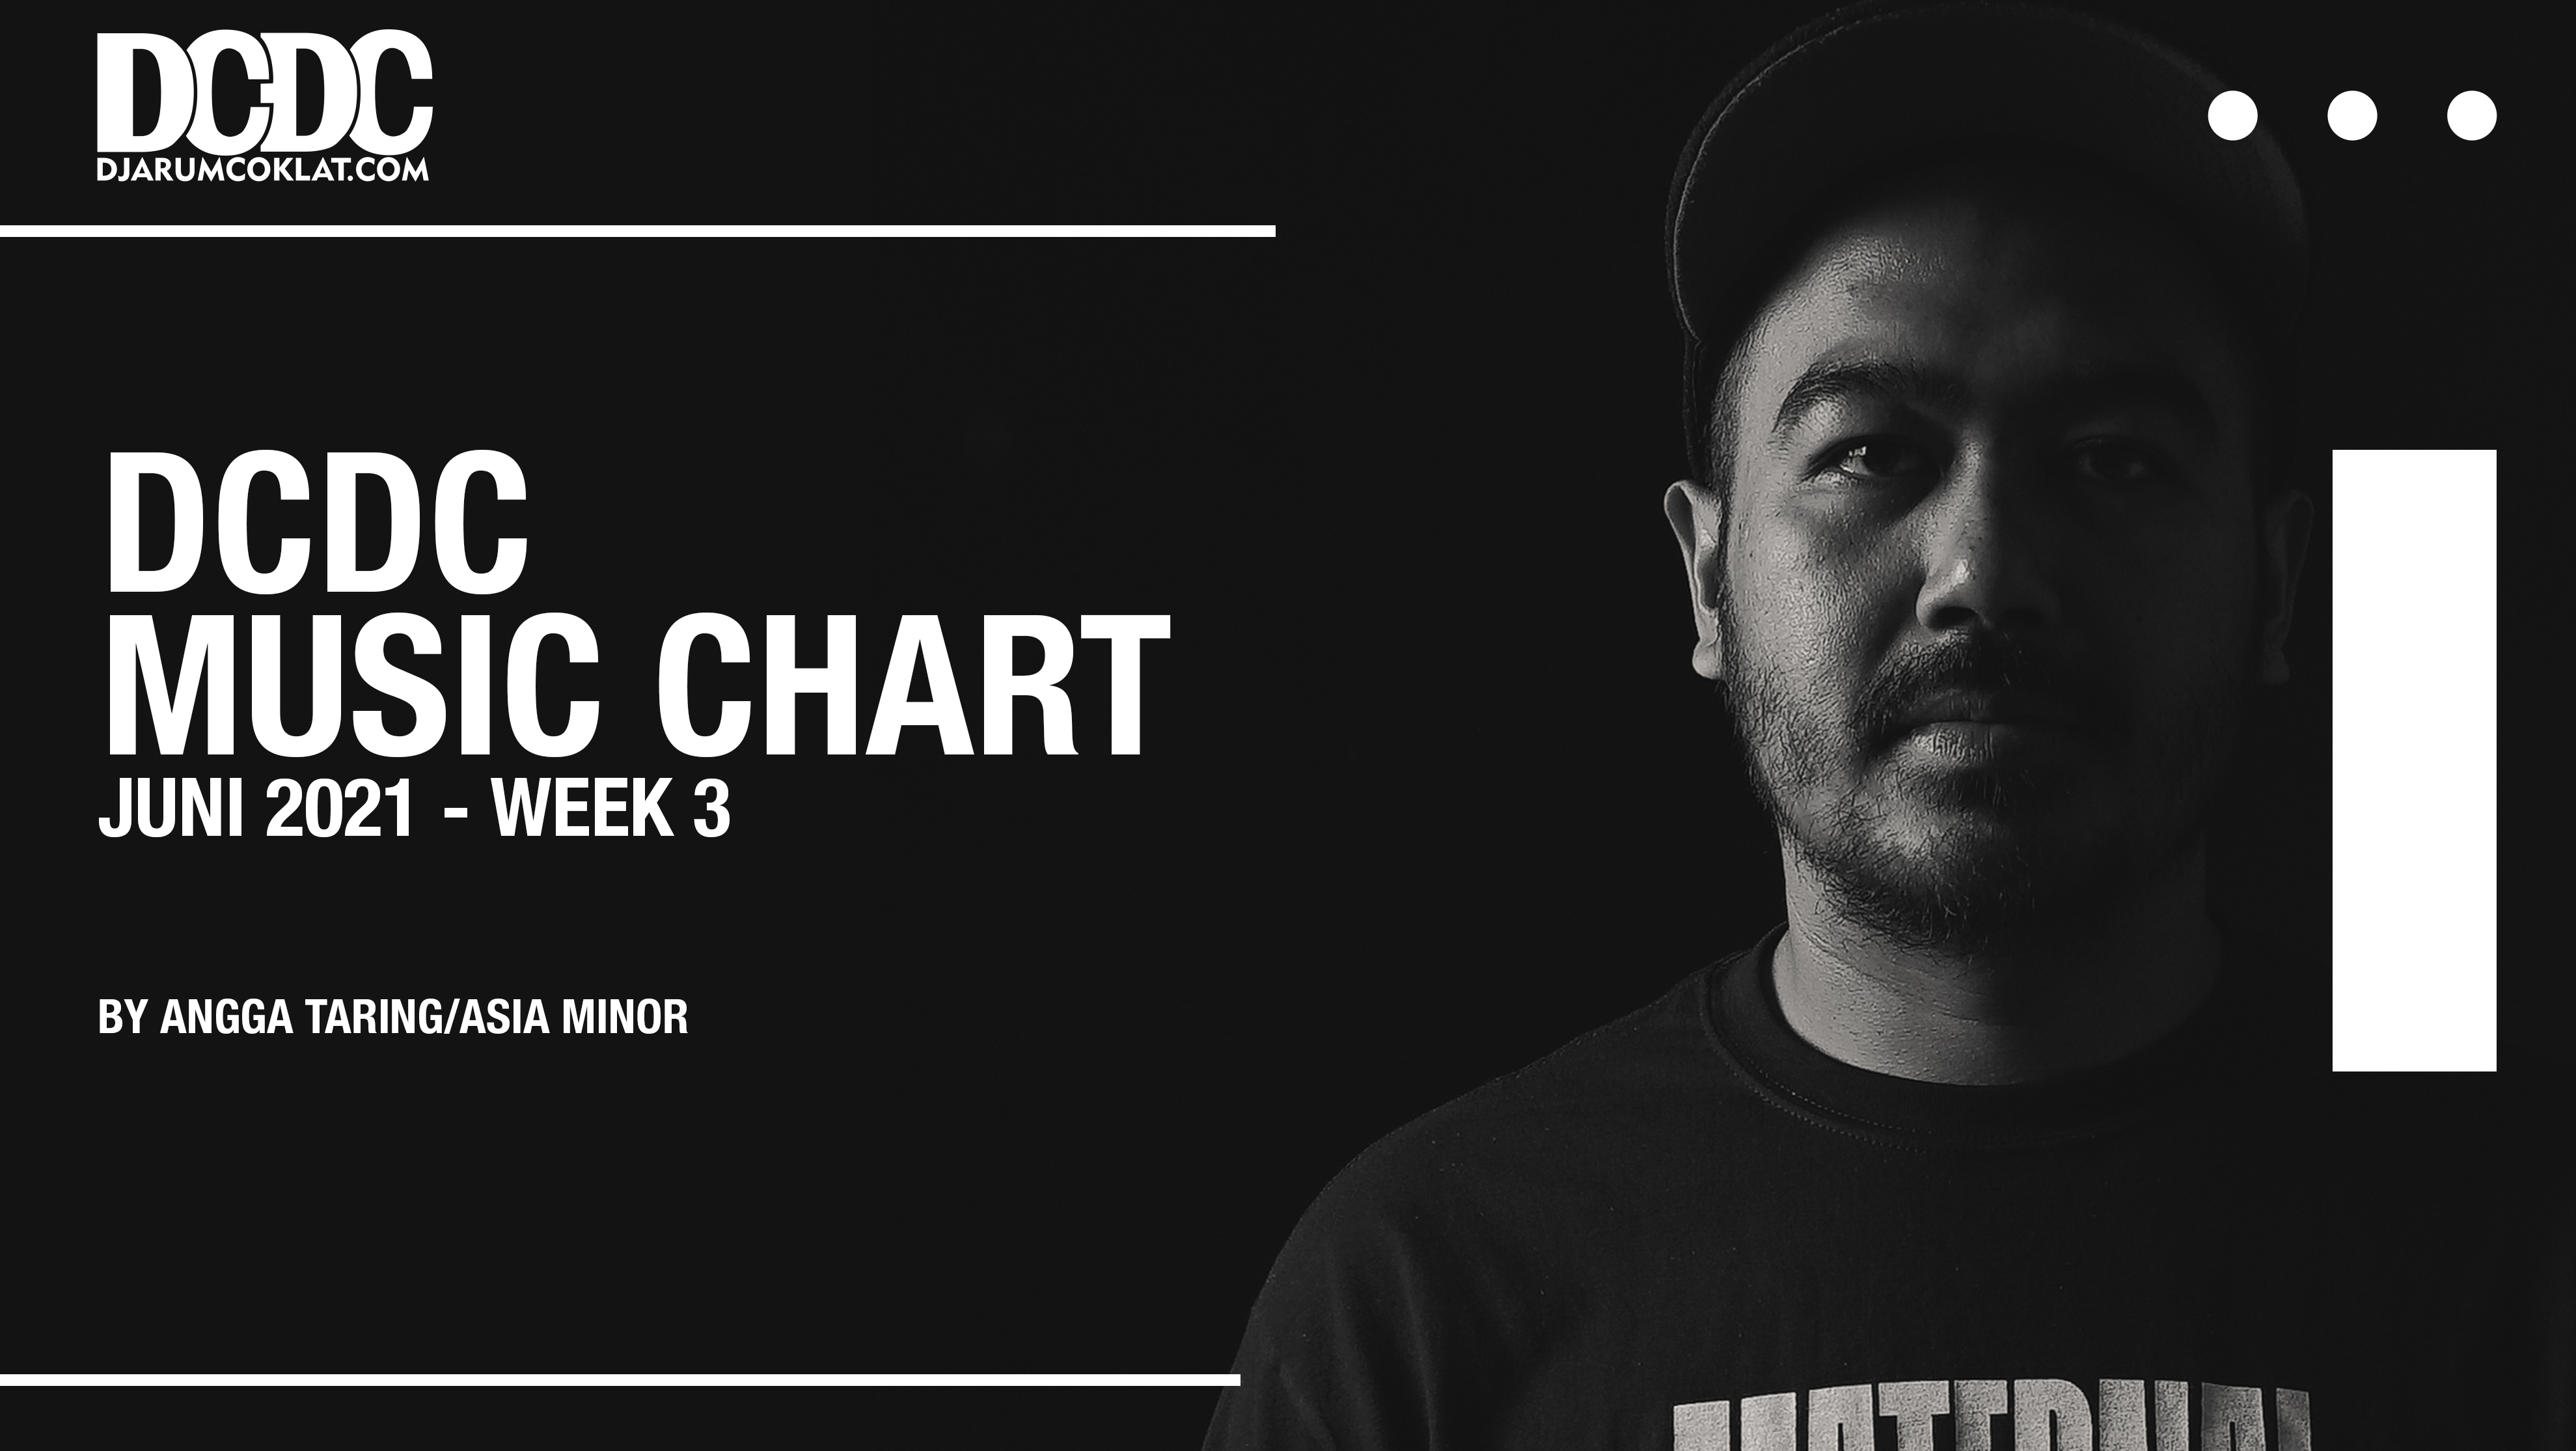 DCDC Music Chart - #3rd Week of June 2021